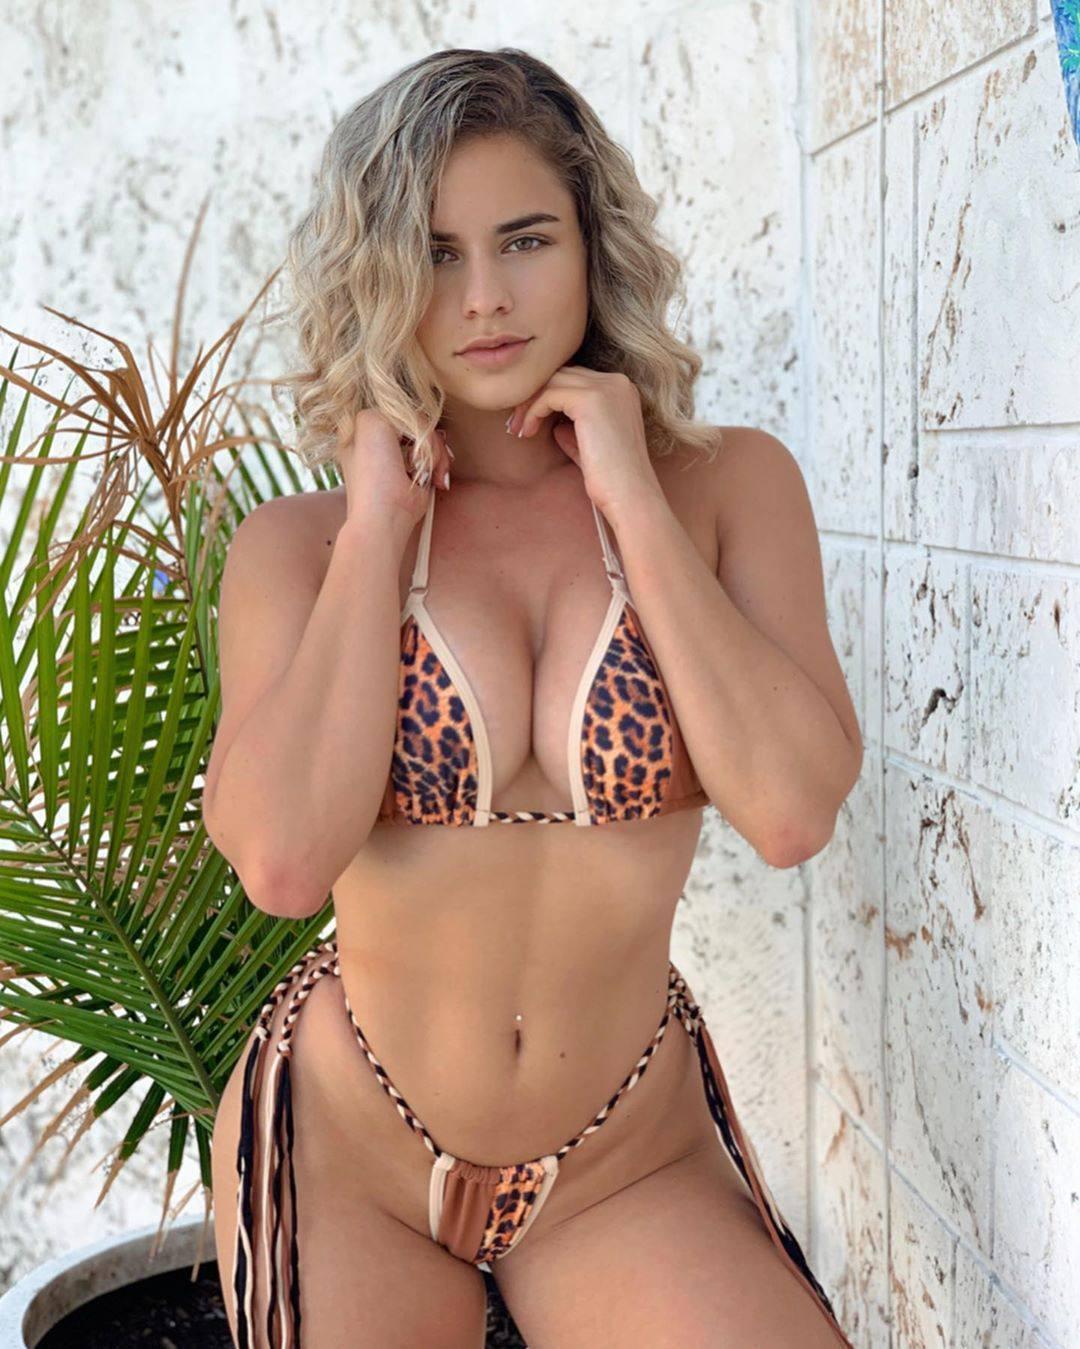 Yaslen Clemente Hot Body